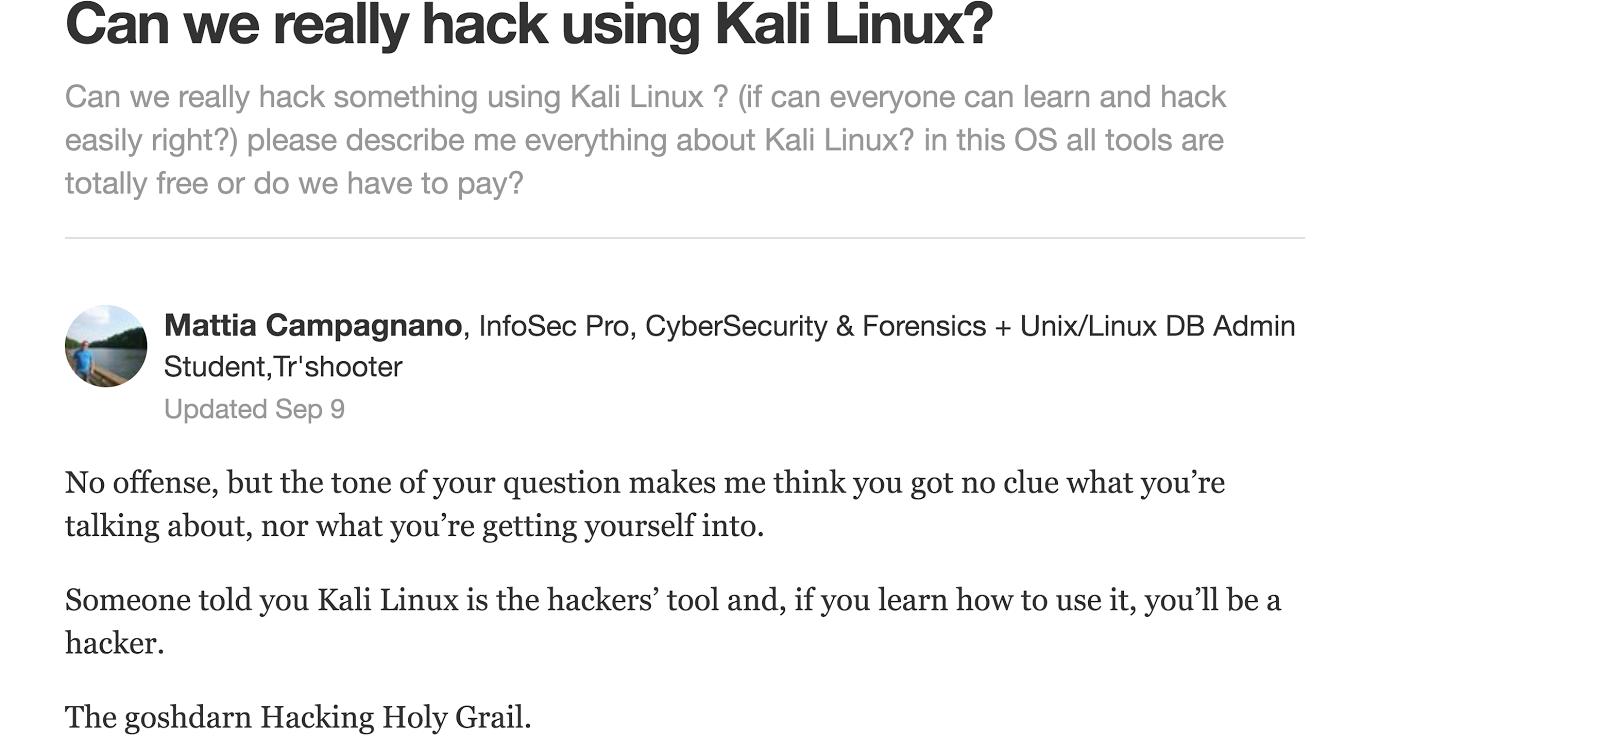 Kali Linux - Hacking Holy Grail? Not really! – Mattia Campagnano